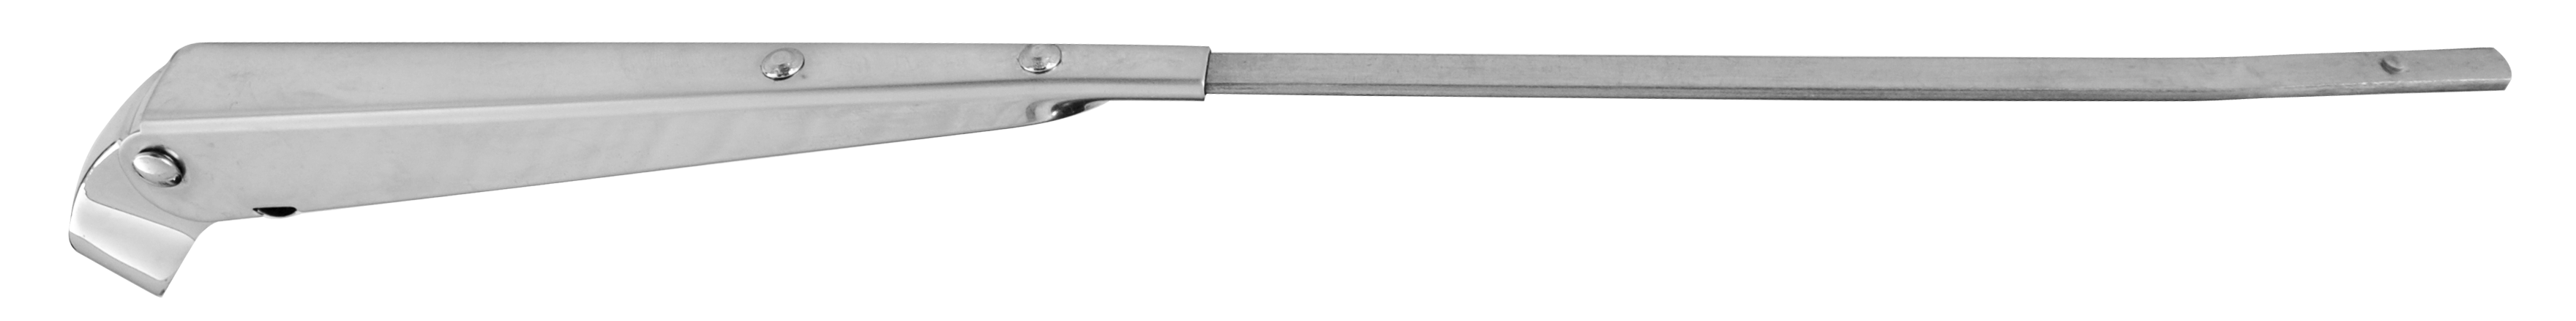 1967-72 C10 windshield wiper arm